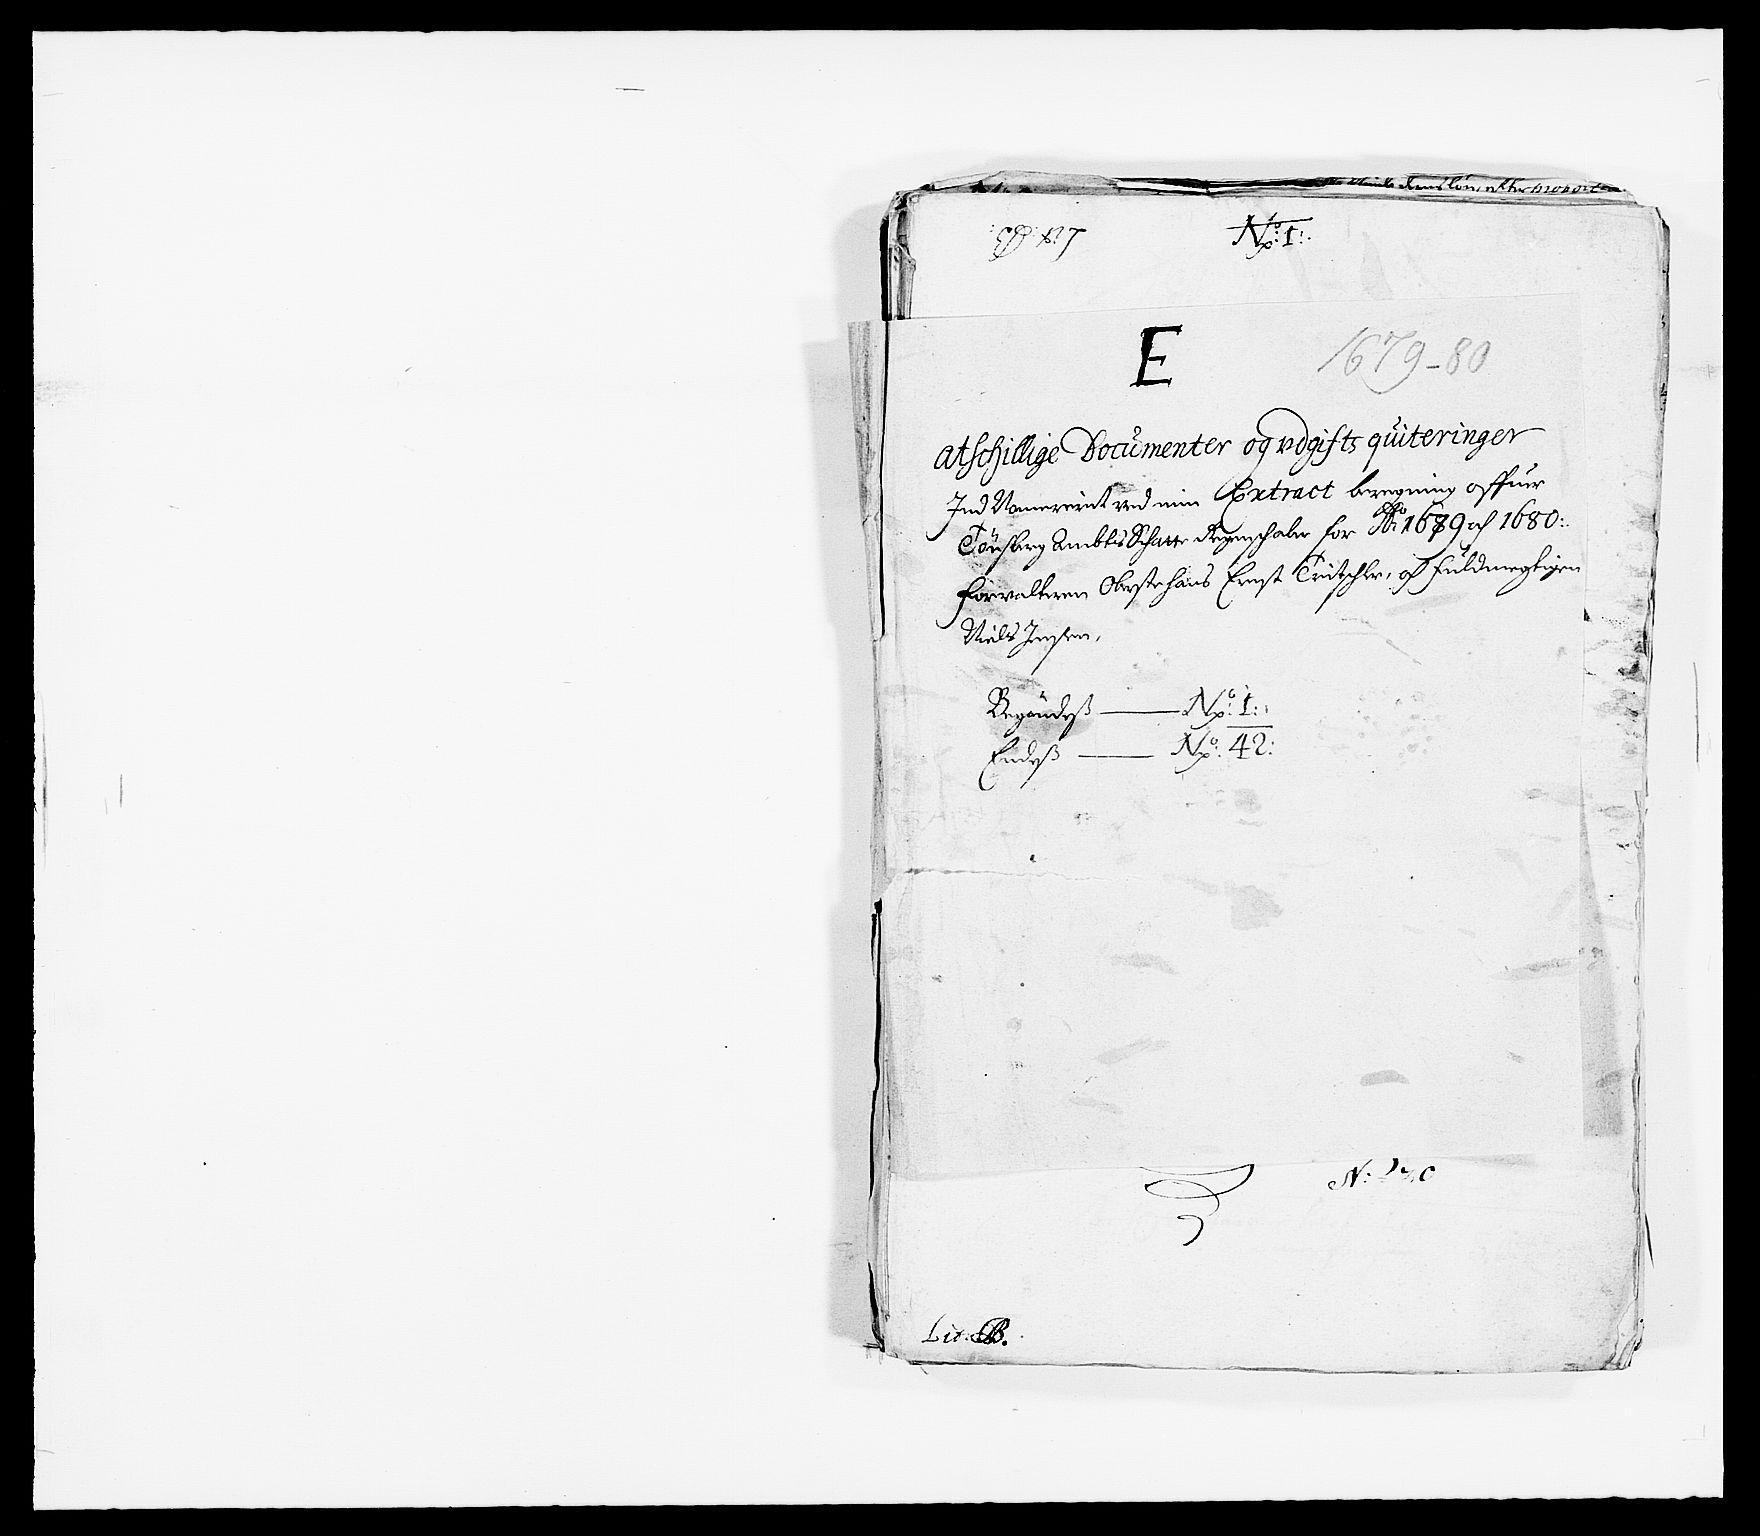 RA, Rentekammeret inntil 1814, Reviderte regnskaper, Fogderegnskap, R32/L1849: Fogderegnskap Jarlsberg grevskap, 1679-1680, s. 113